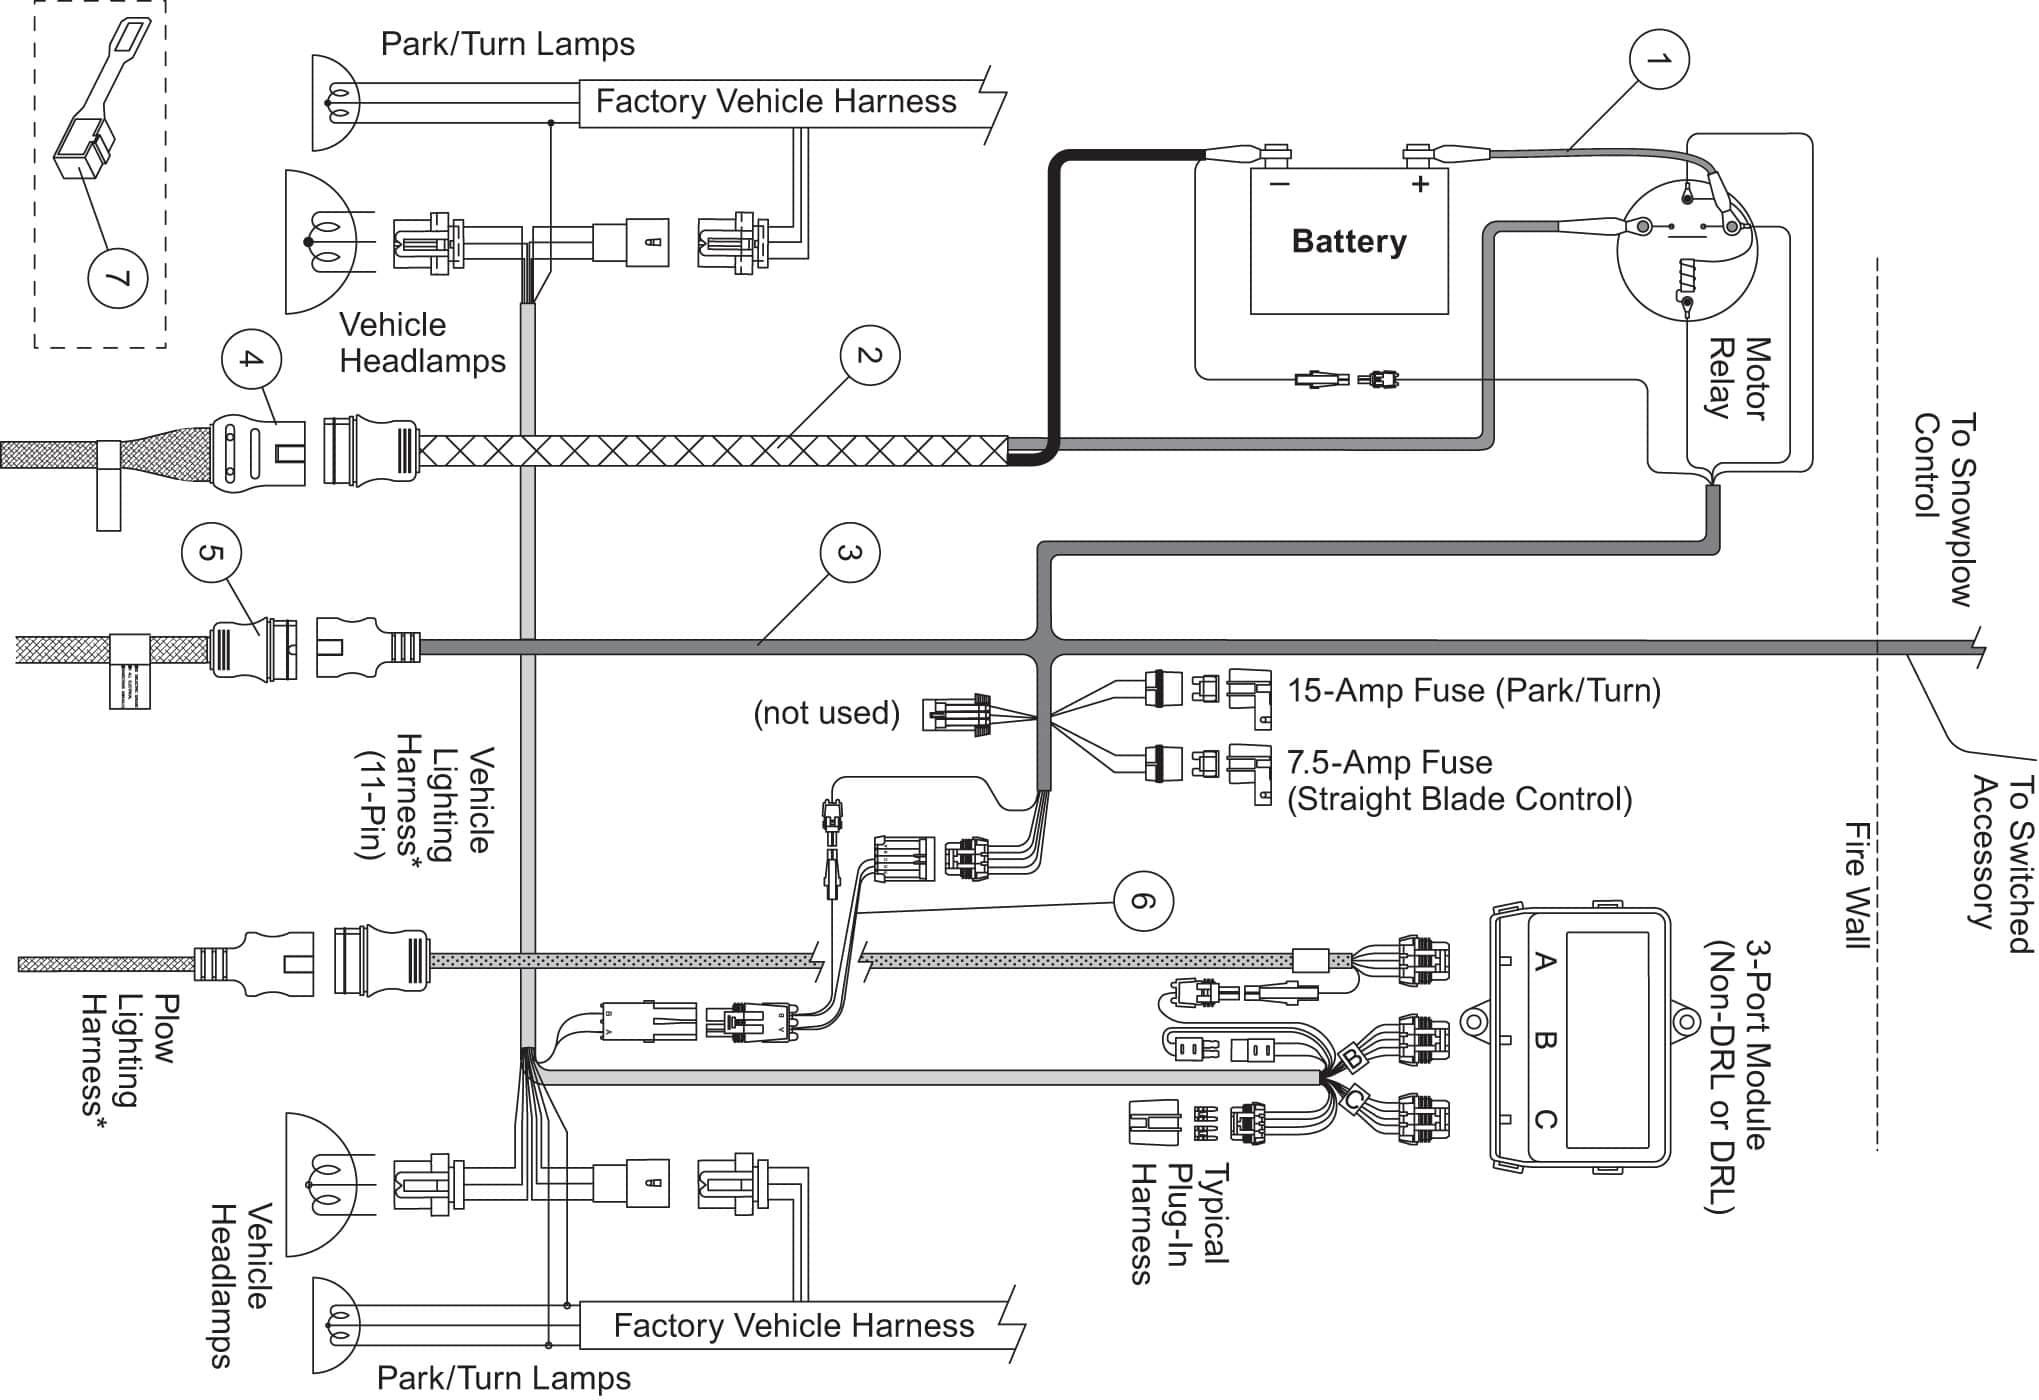 Western Unimount Wiring Harness - Wiring Diagrams Hubs - Western Snow Plow Wiring Diagram